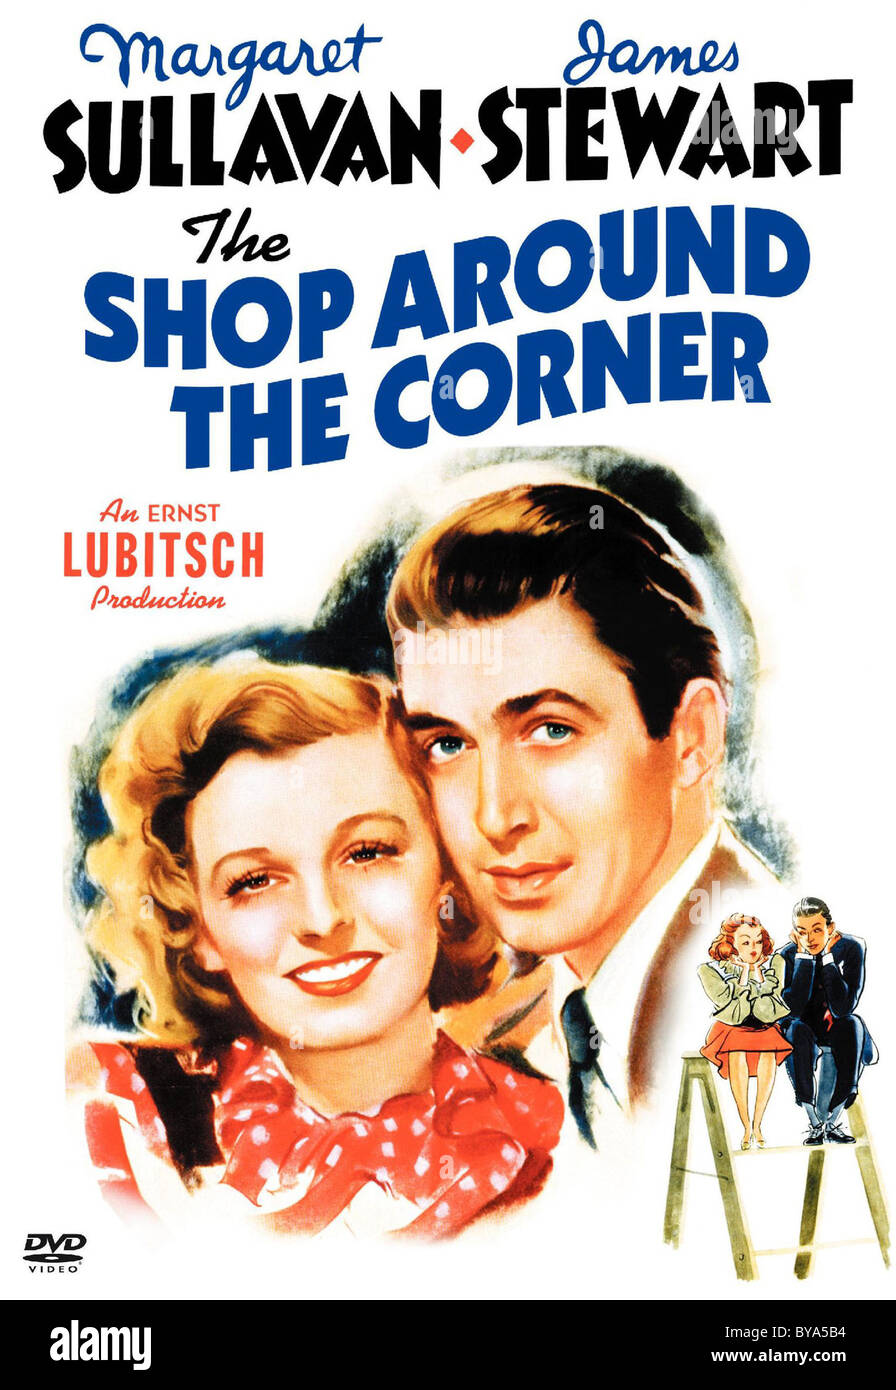 The Shop around the Corner Year : 1940 USA Director : Ernst Lubitsch Movie poster (USA) - Stock Image